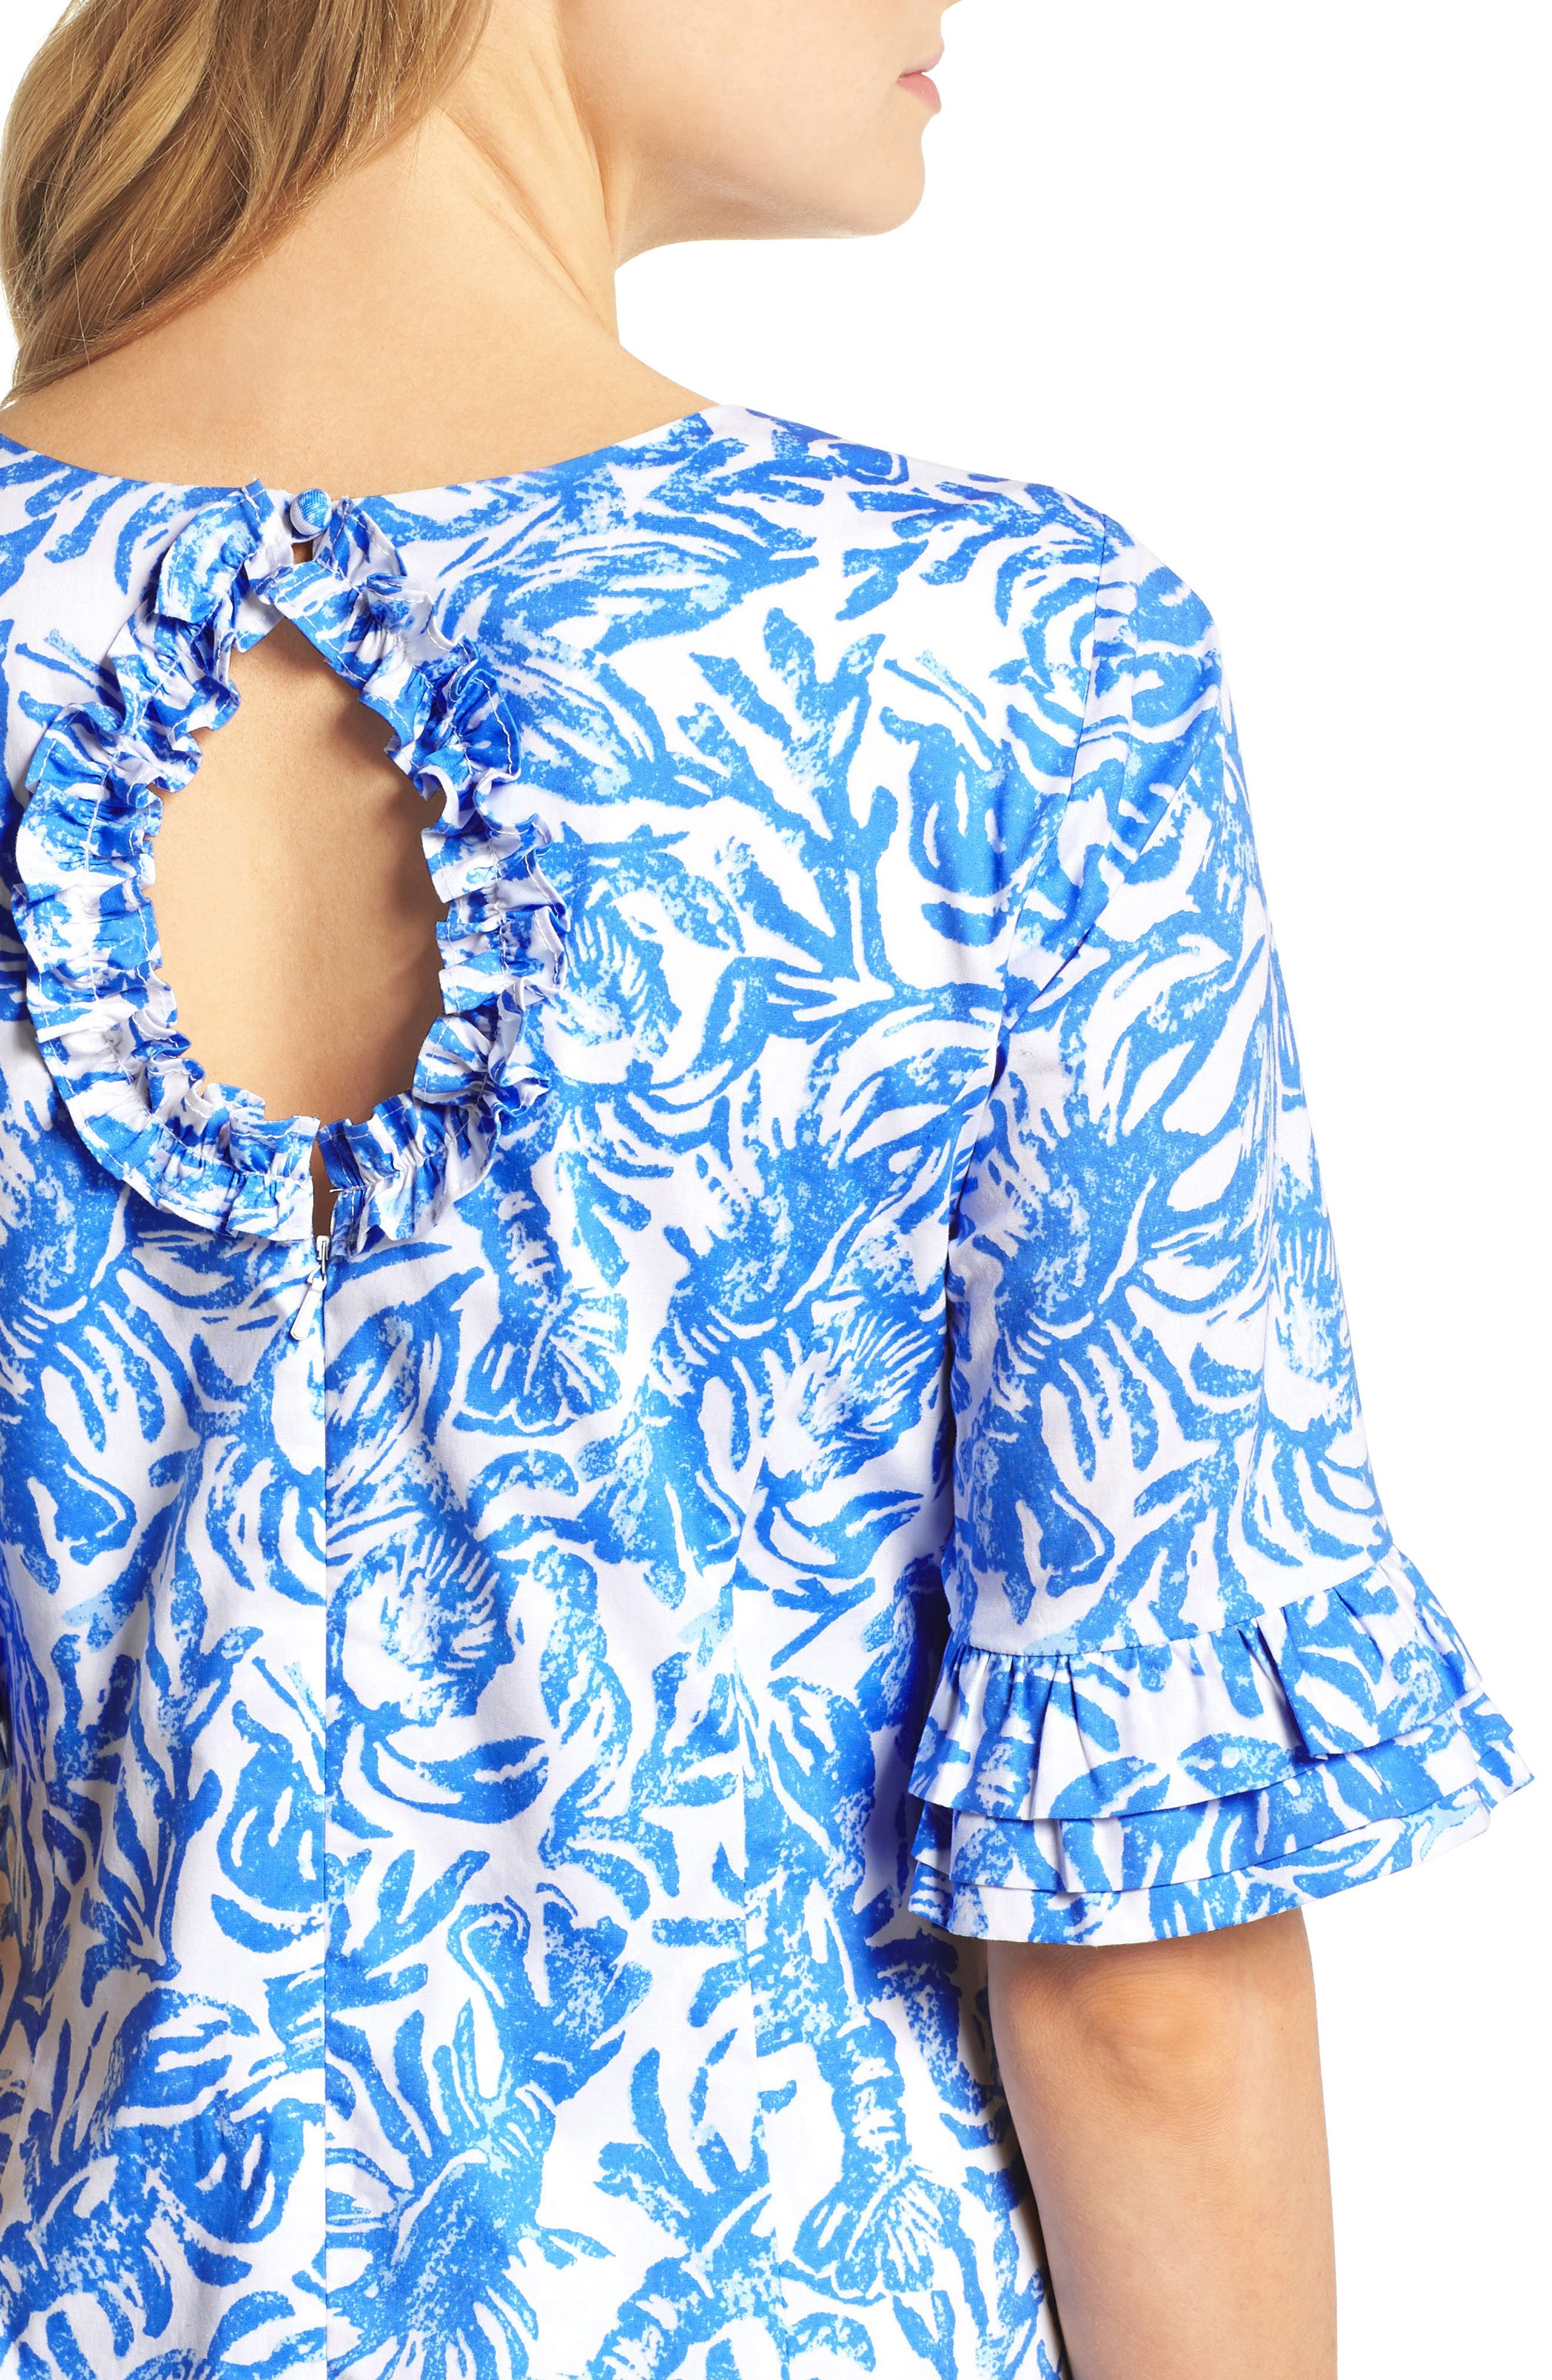 Fiesta Stretch Sheath Dress,                             Alternate thumbnail 4, color,                             415